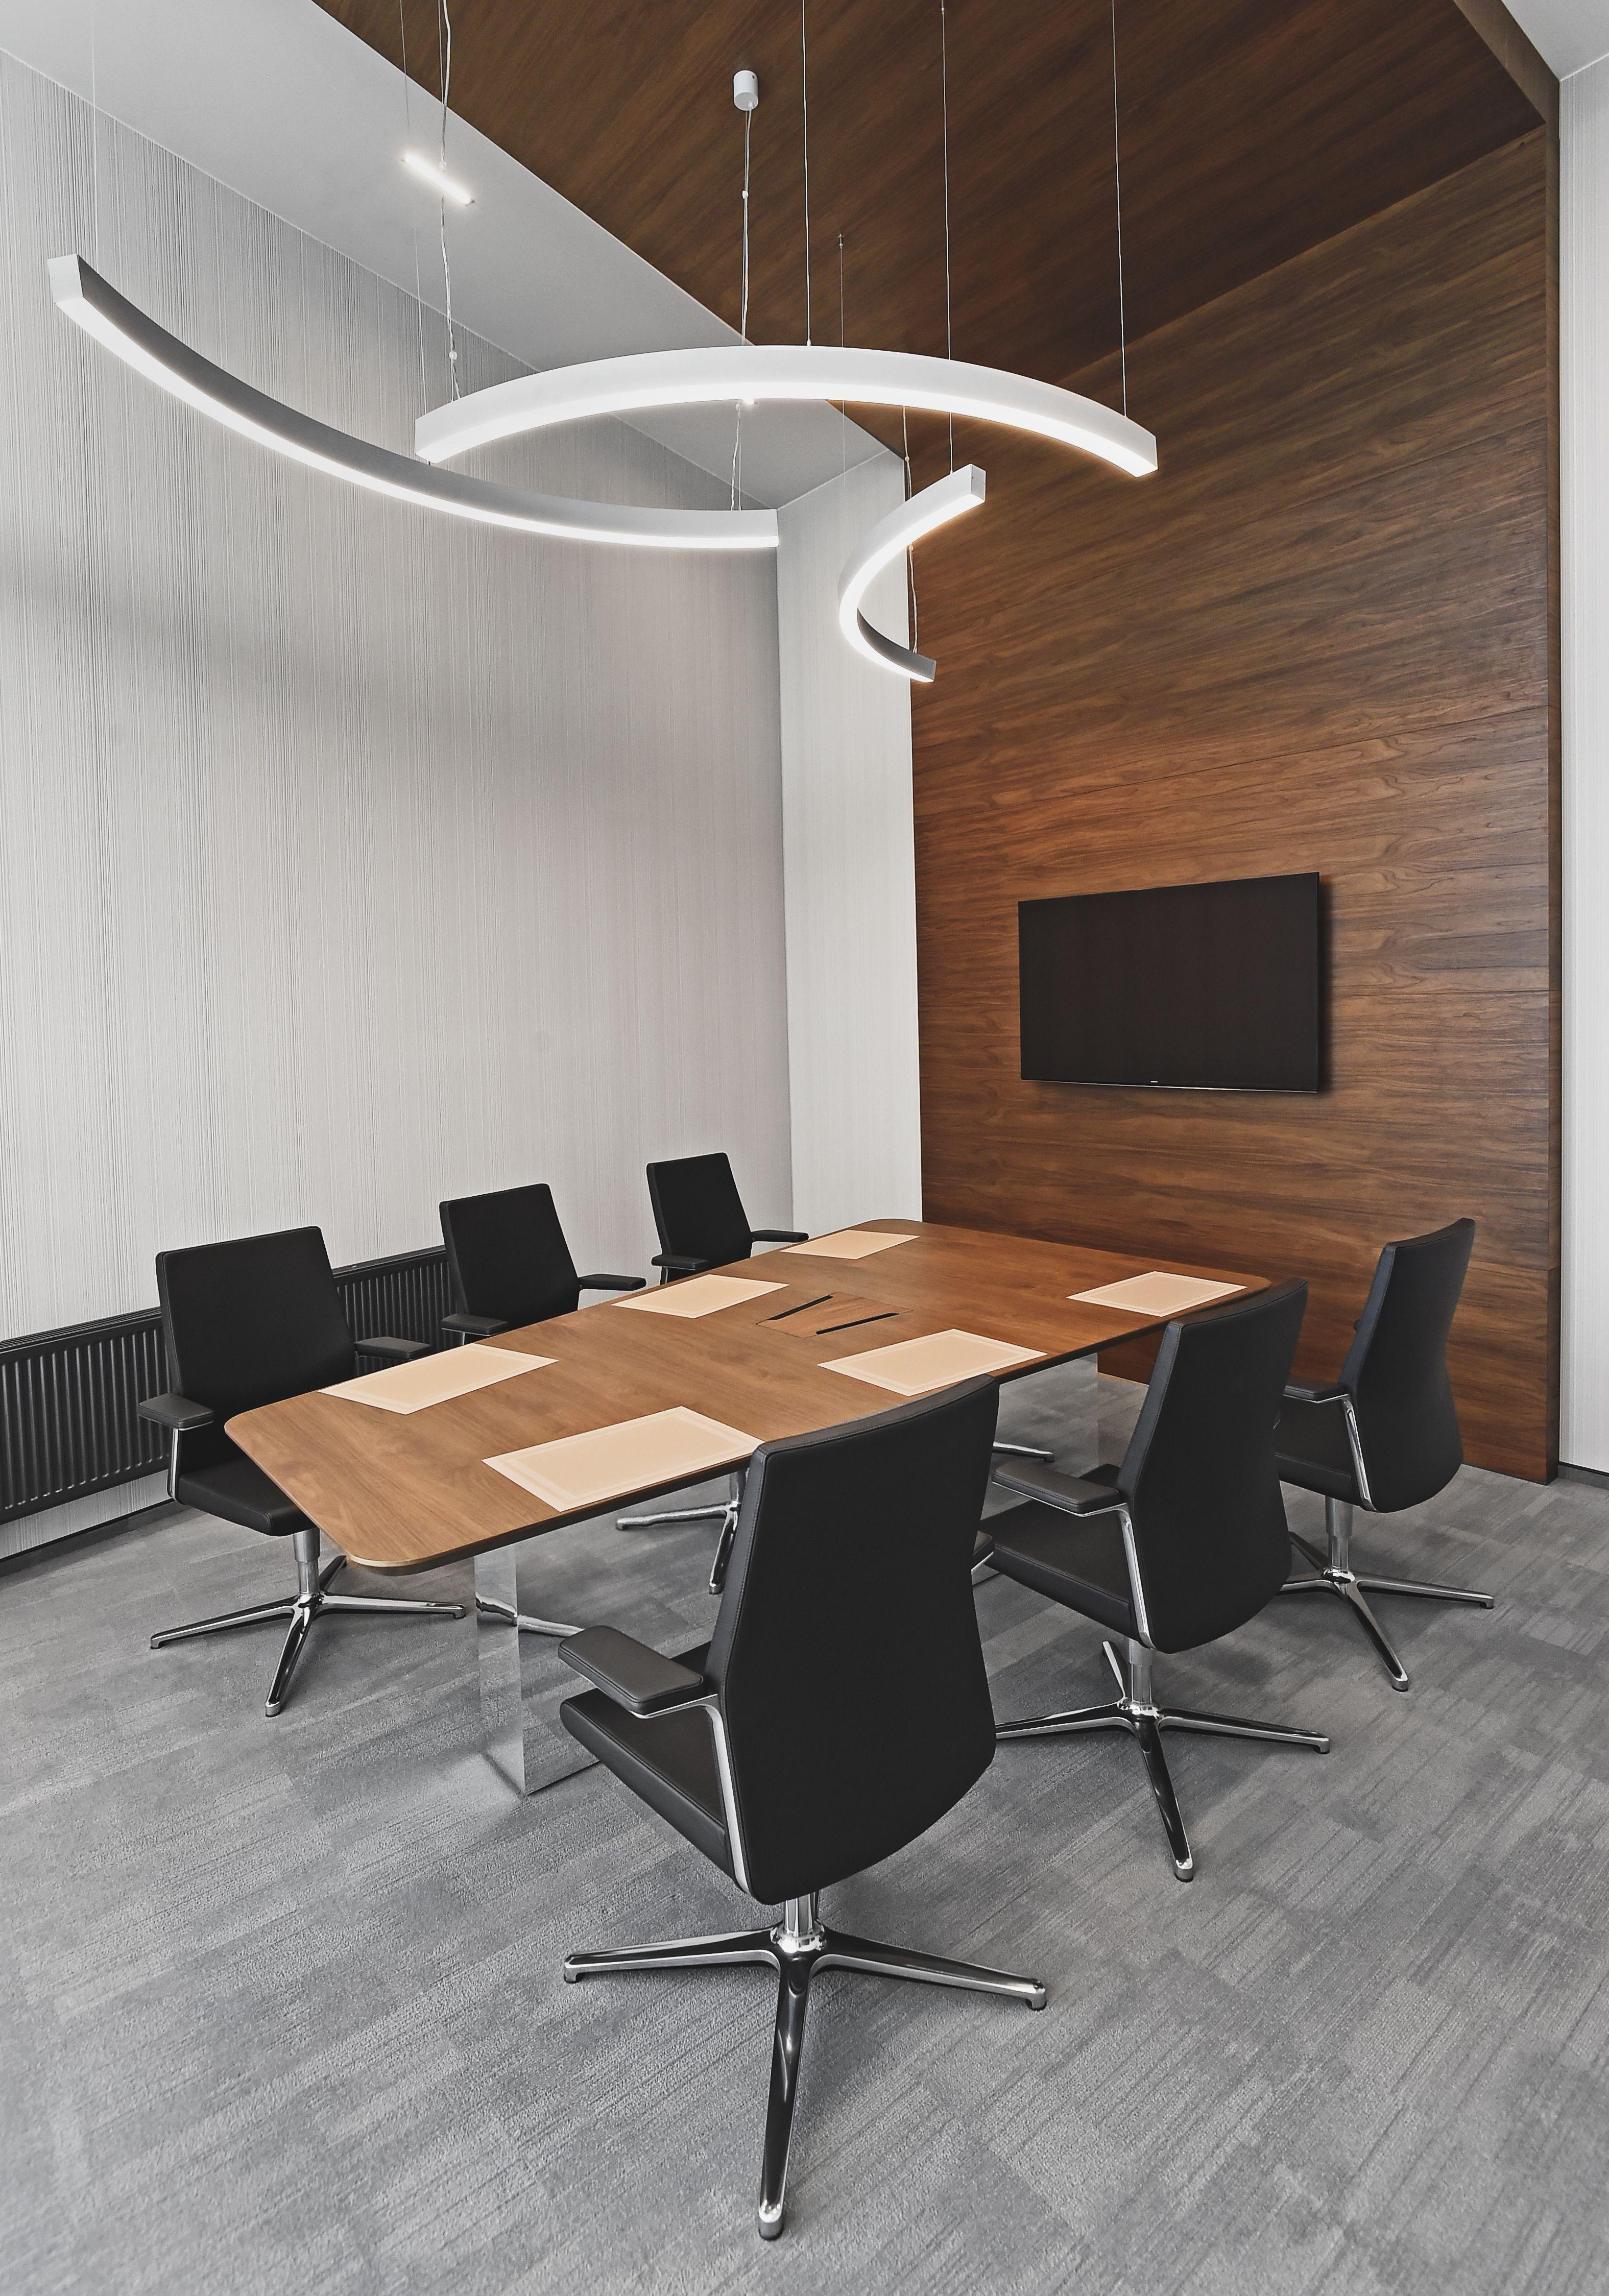 Office Furniture Exclusive Walnut Wall Panels Modern Design